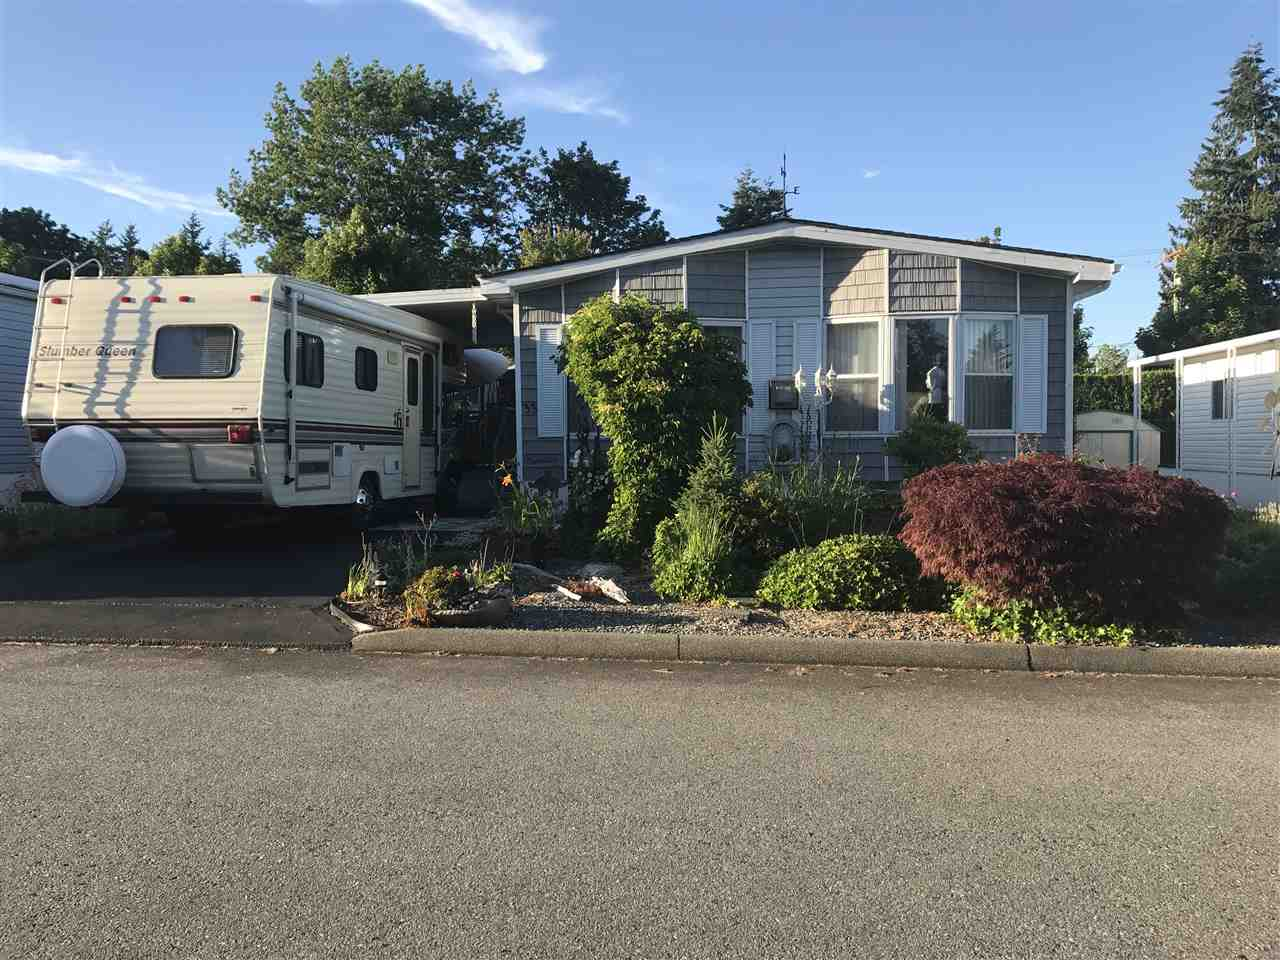 Detached at 33 8670 156TH STREET, Unit 33, Surrey, British Columbia. Image 1